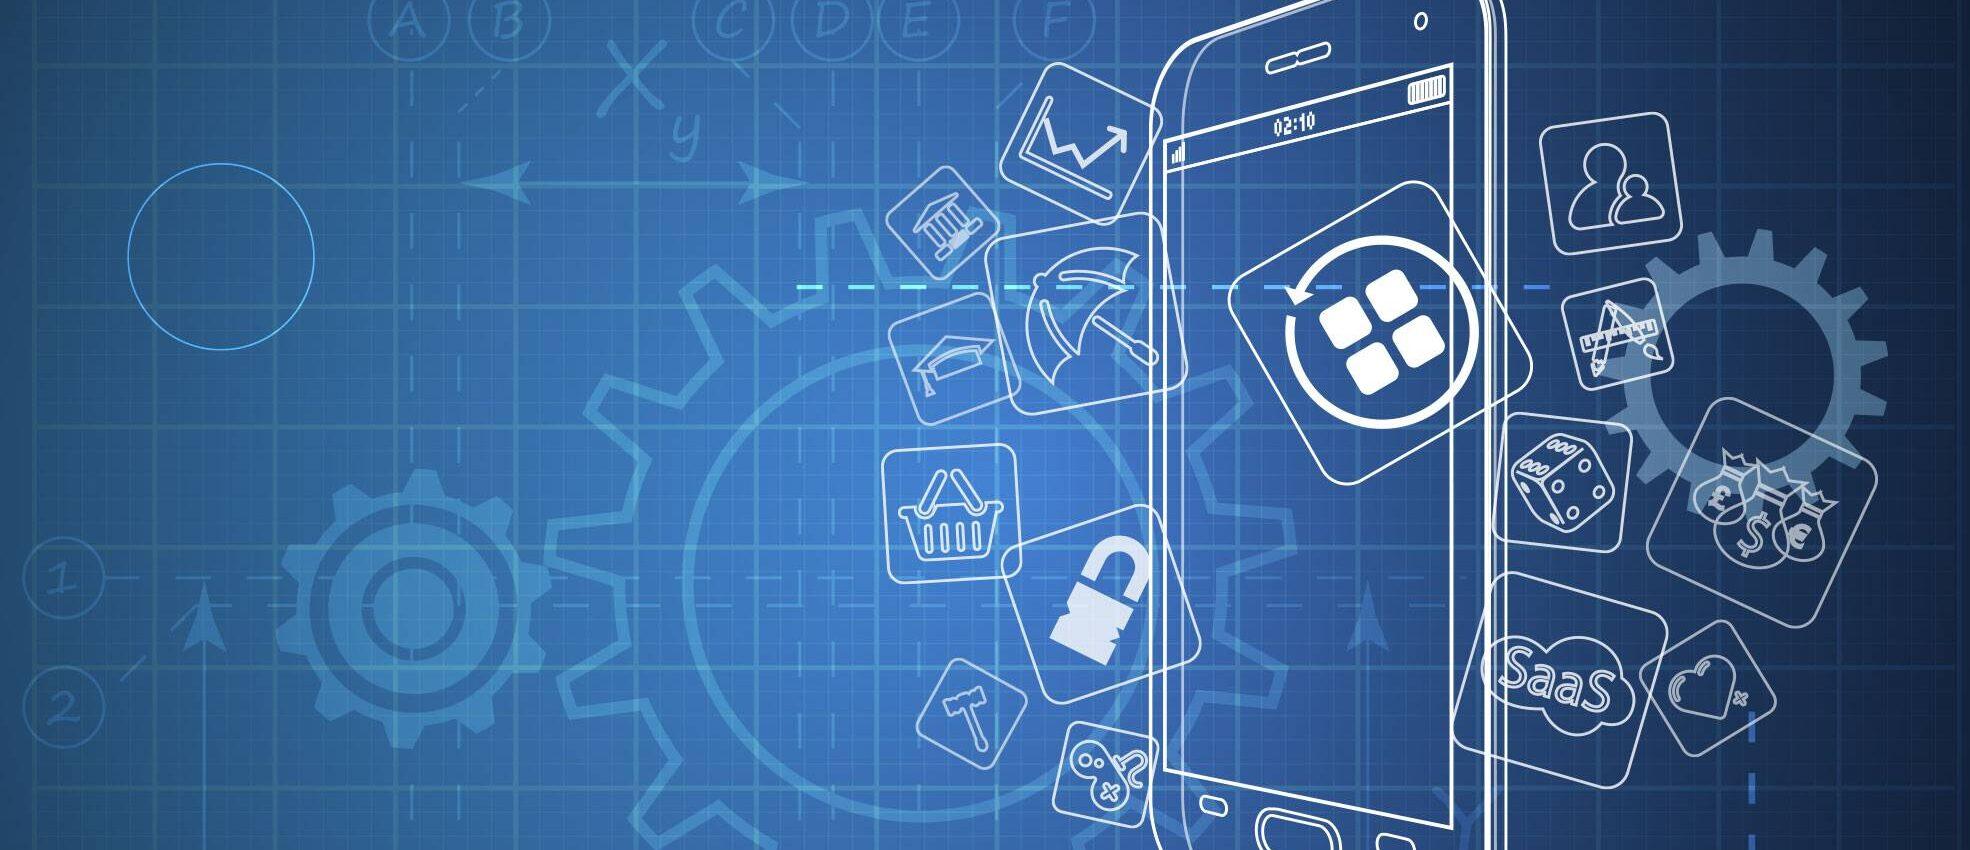 VoIP vs Landline in 2020: Best Business Phone Solutions